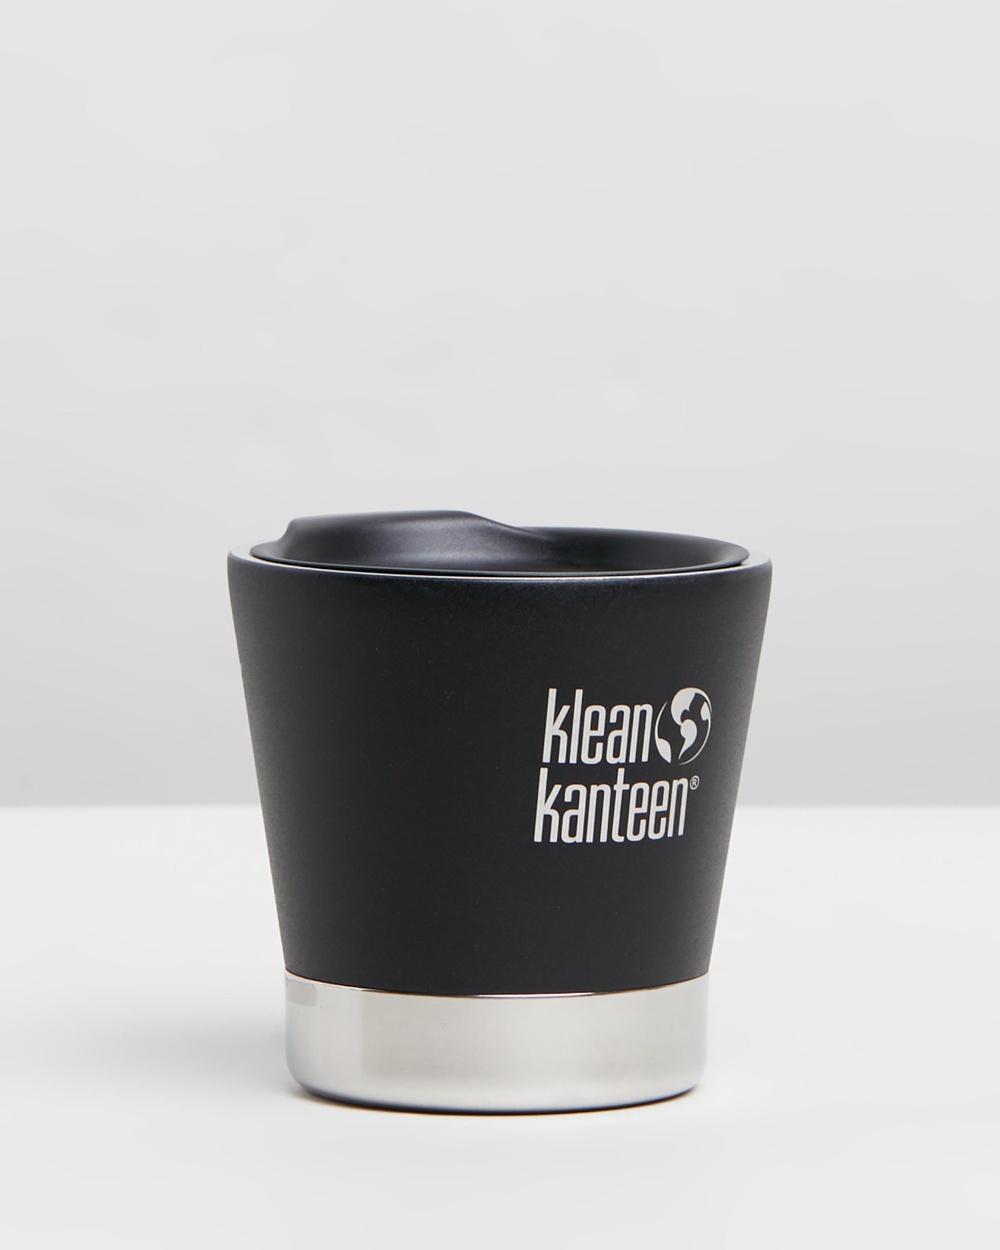 Klean Kanteen 8oz Insulated Tumbler Home Shale Black